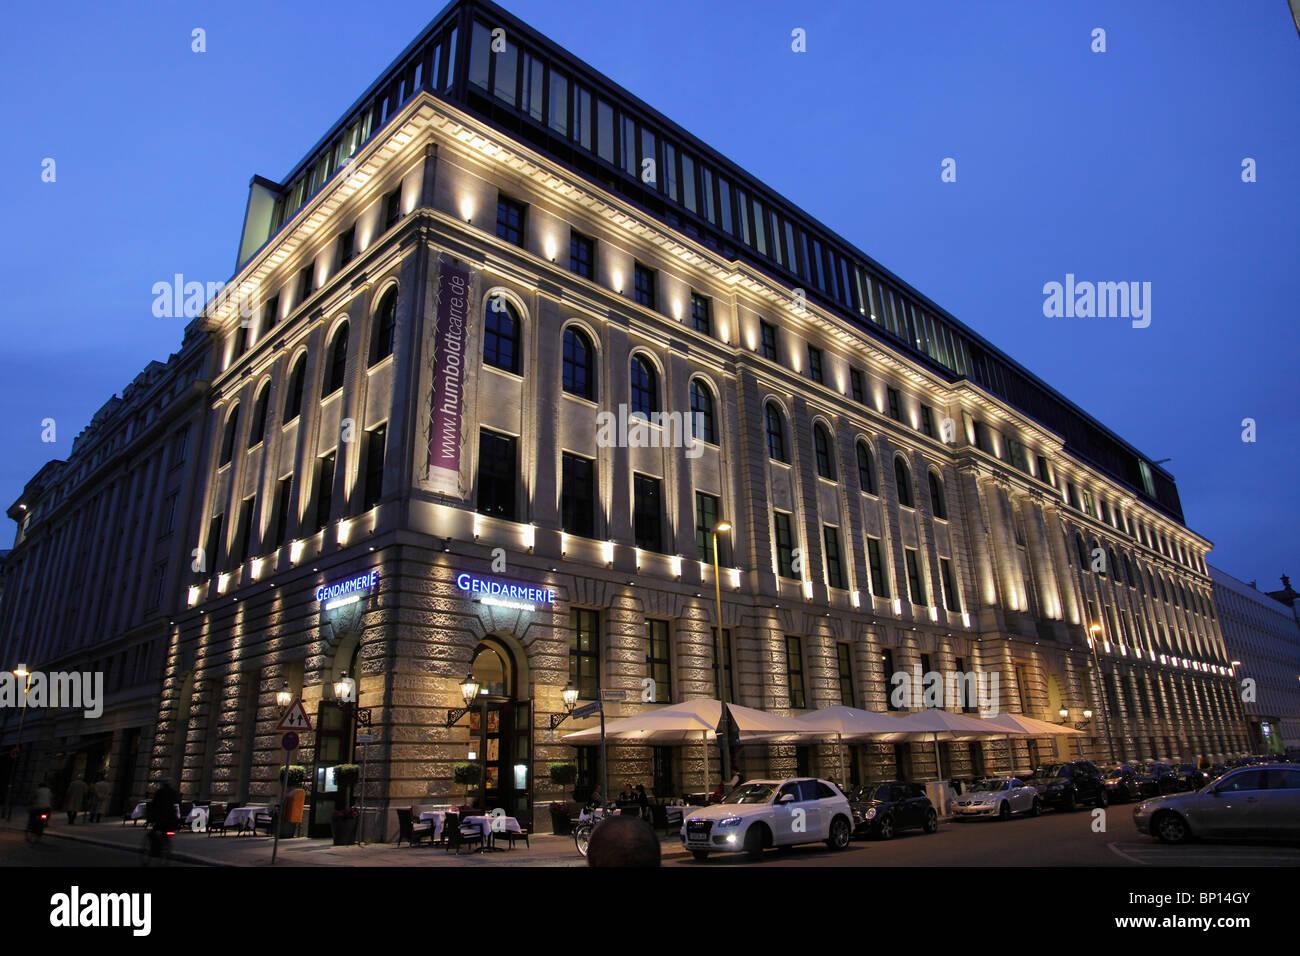 Germany, Berlin, Mitte, Gendarmerie Restaurant - Stock Image